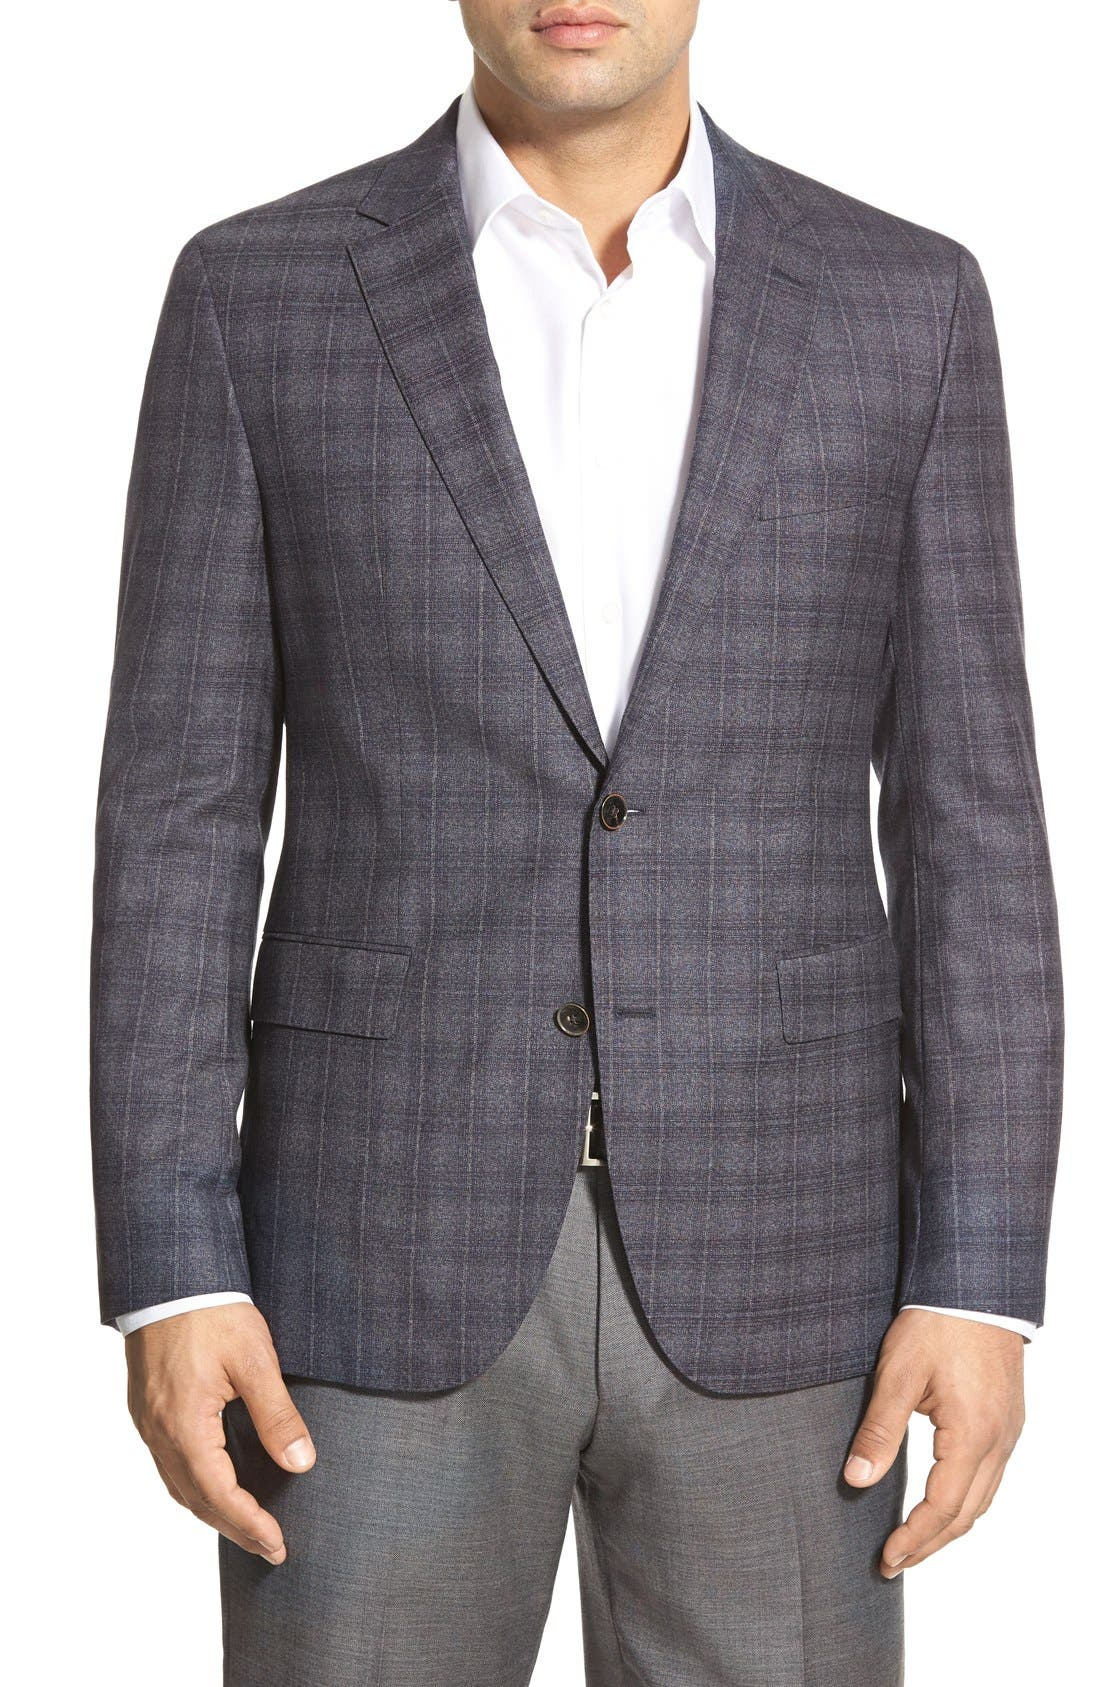 ZZDNUHUGO BOSS BOSS 'Jayden' Trim Fit Plaid Wool Sport Coat, Main, color, 420